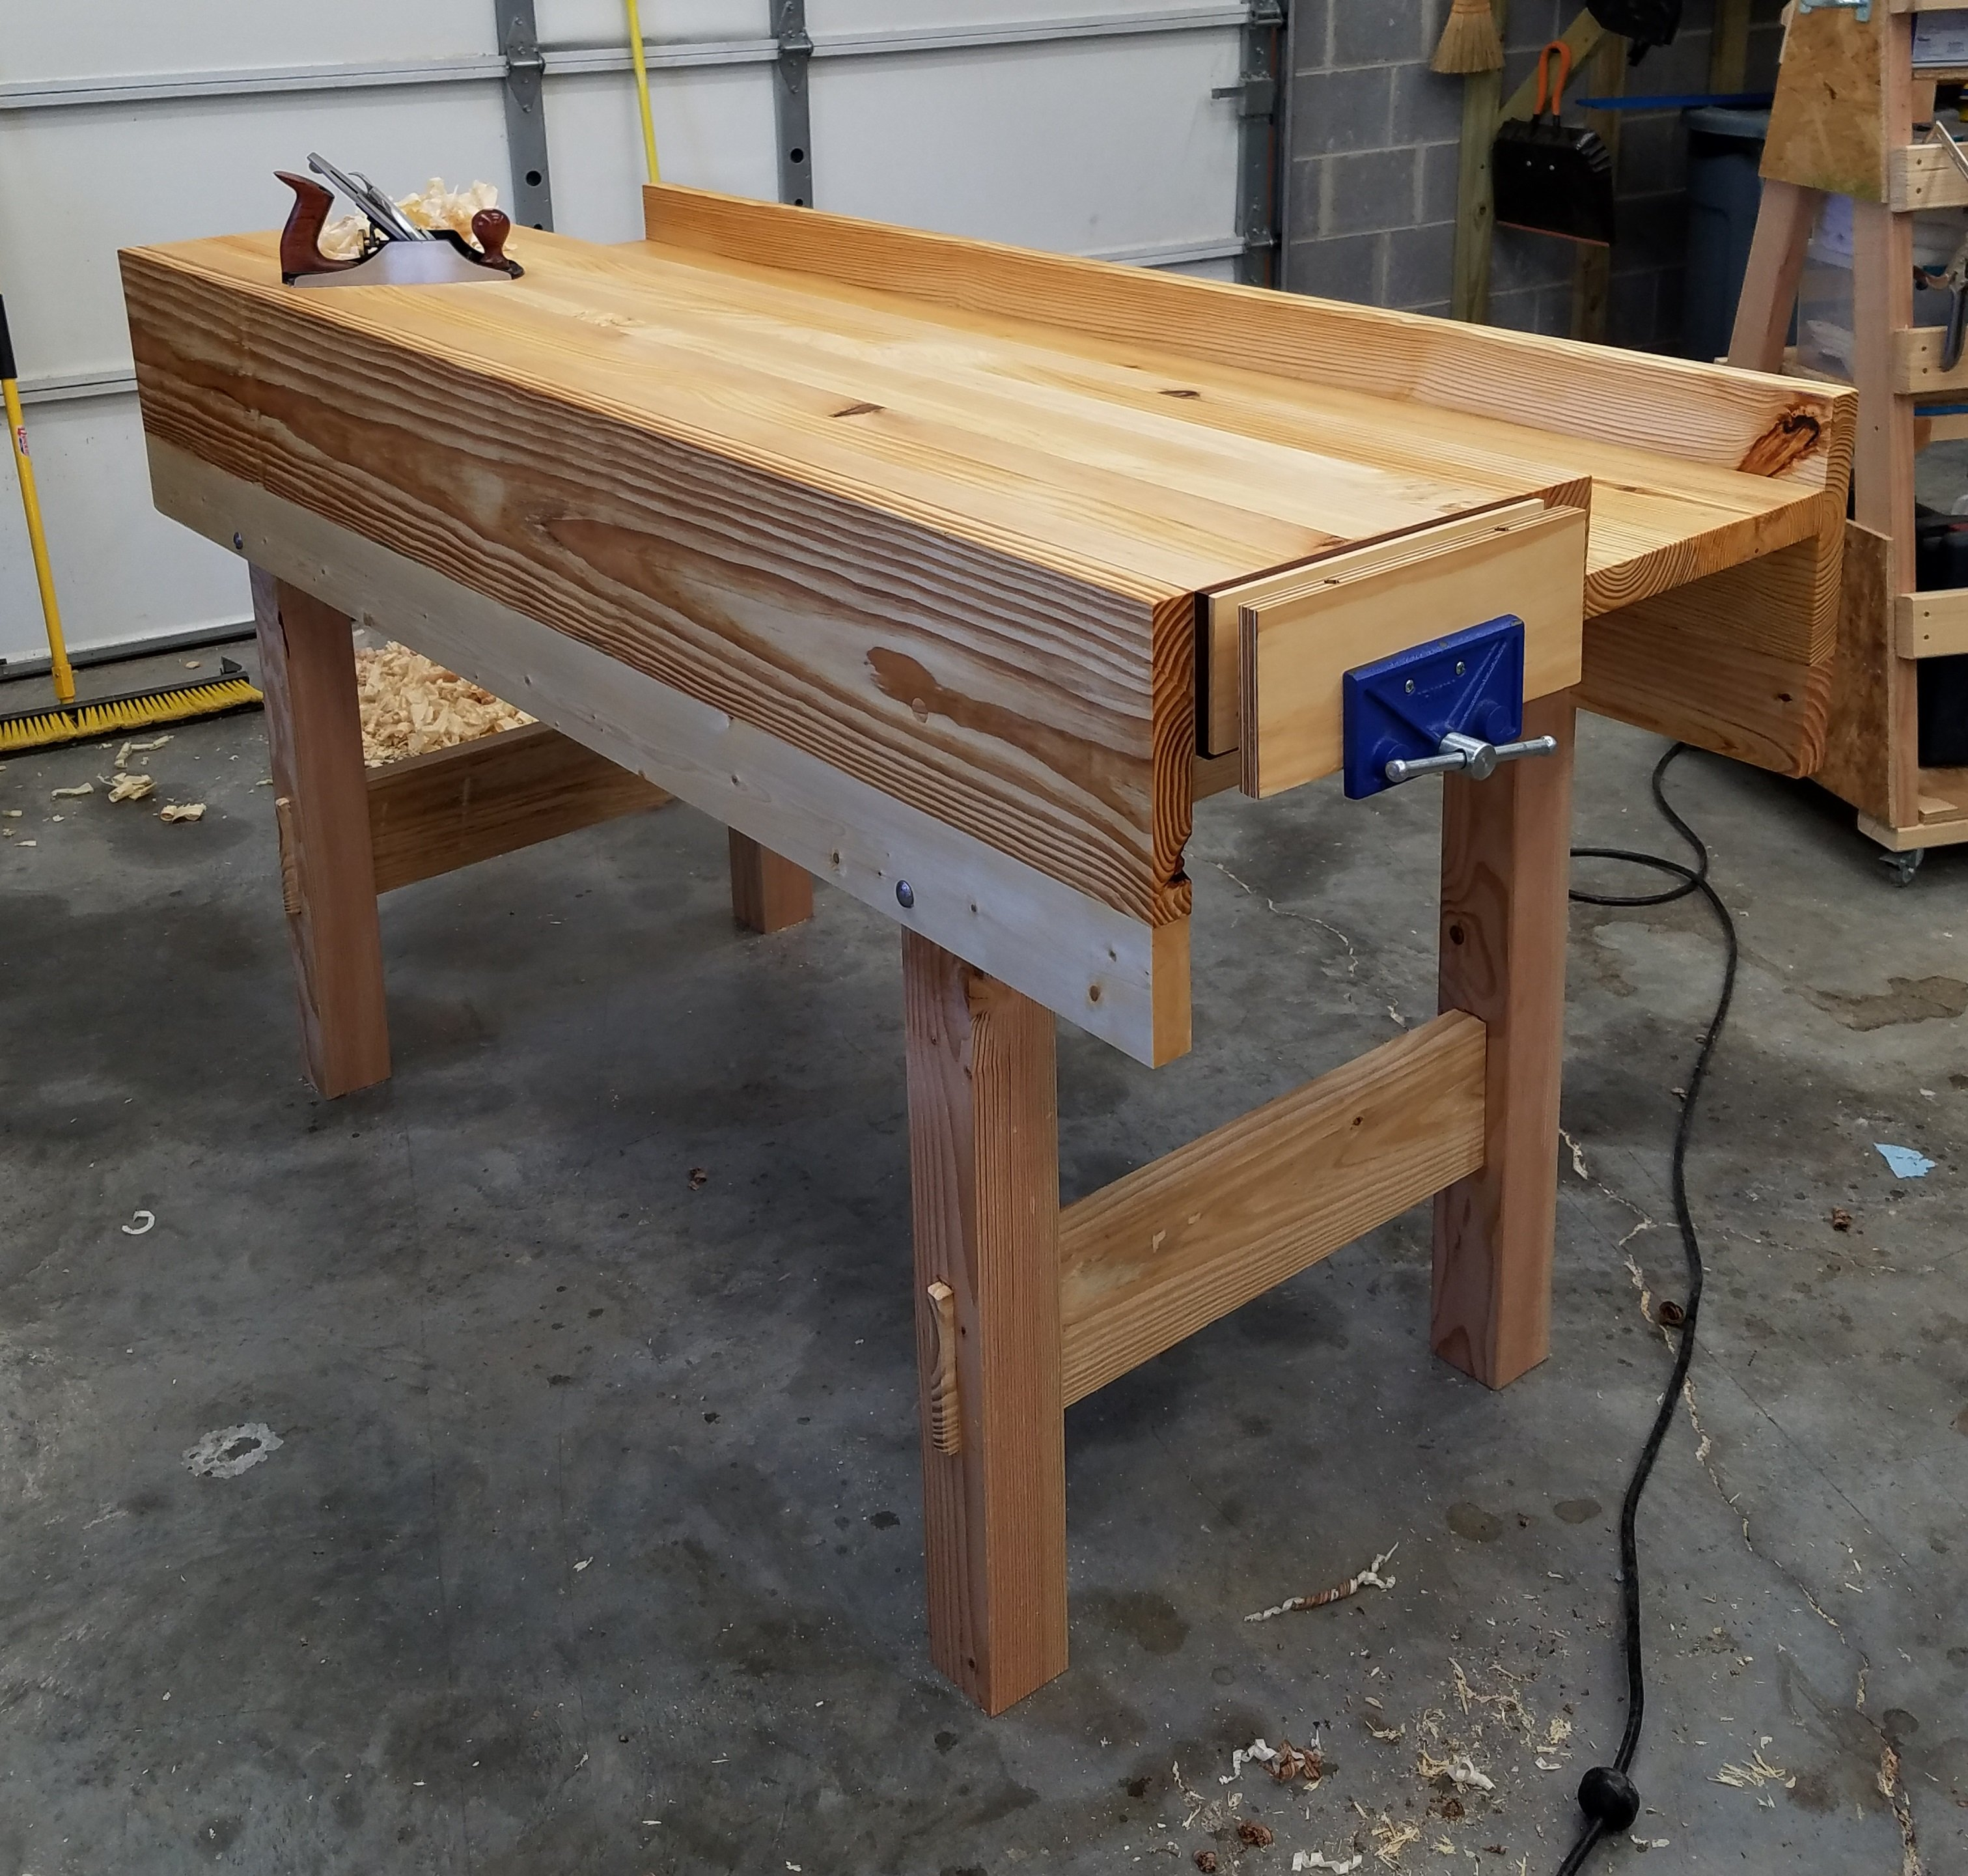 Workbench by Greg Marshall